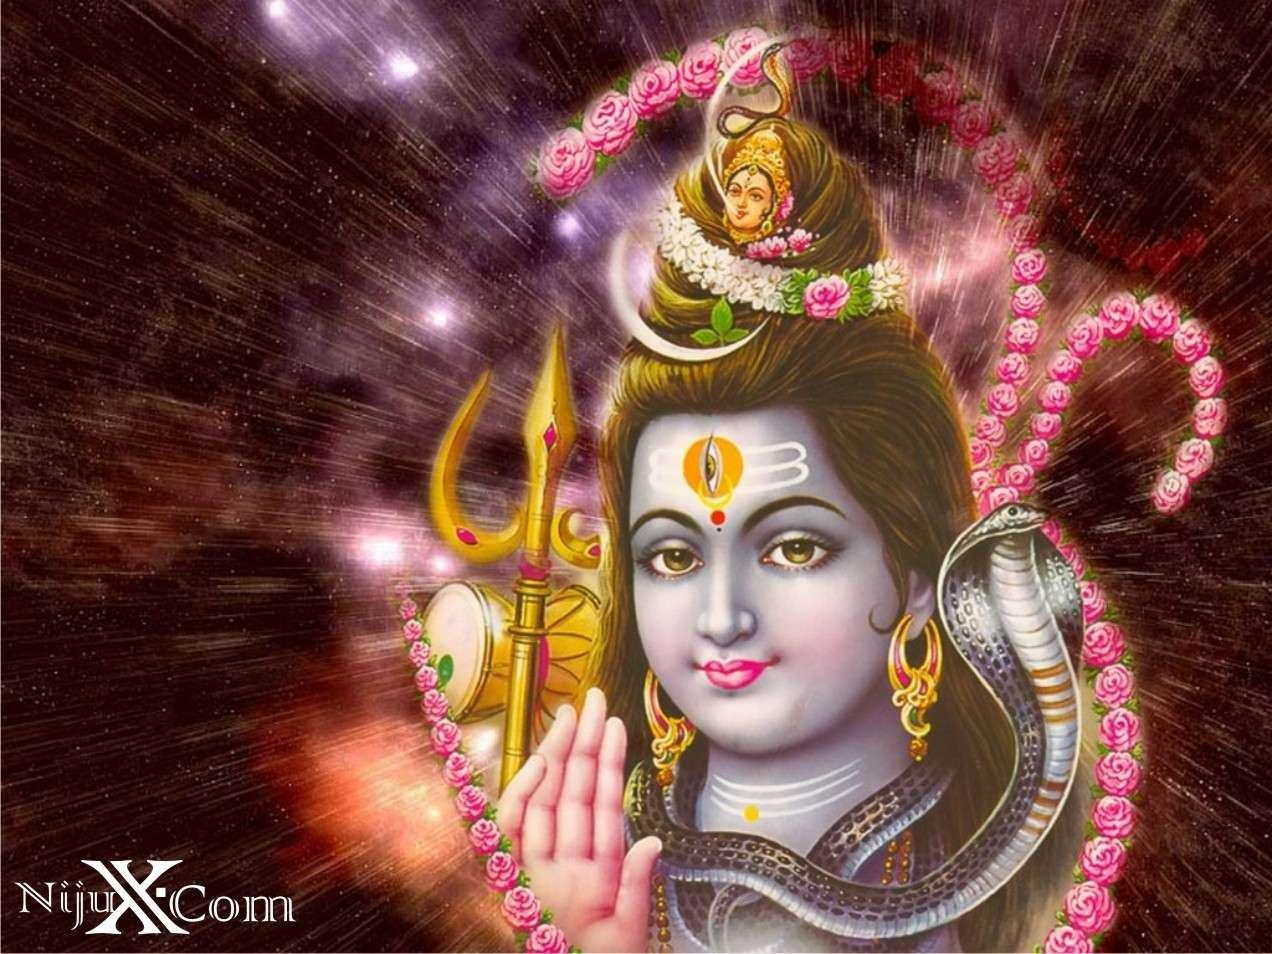 Wallpaper download karo - God Devotional Hd God Images Wallpapers Backgrounds Lord Shiva